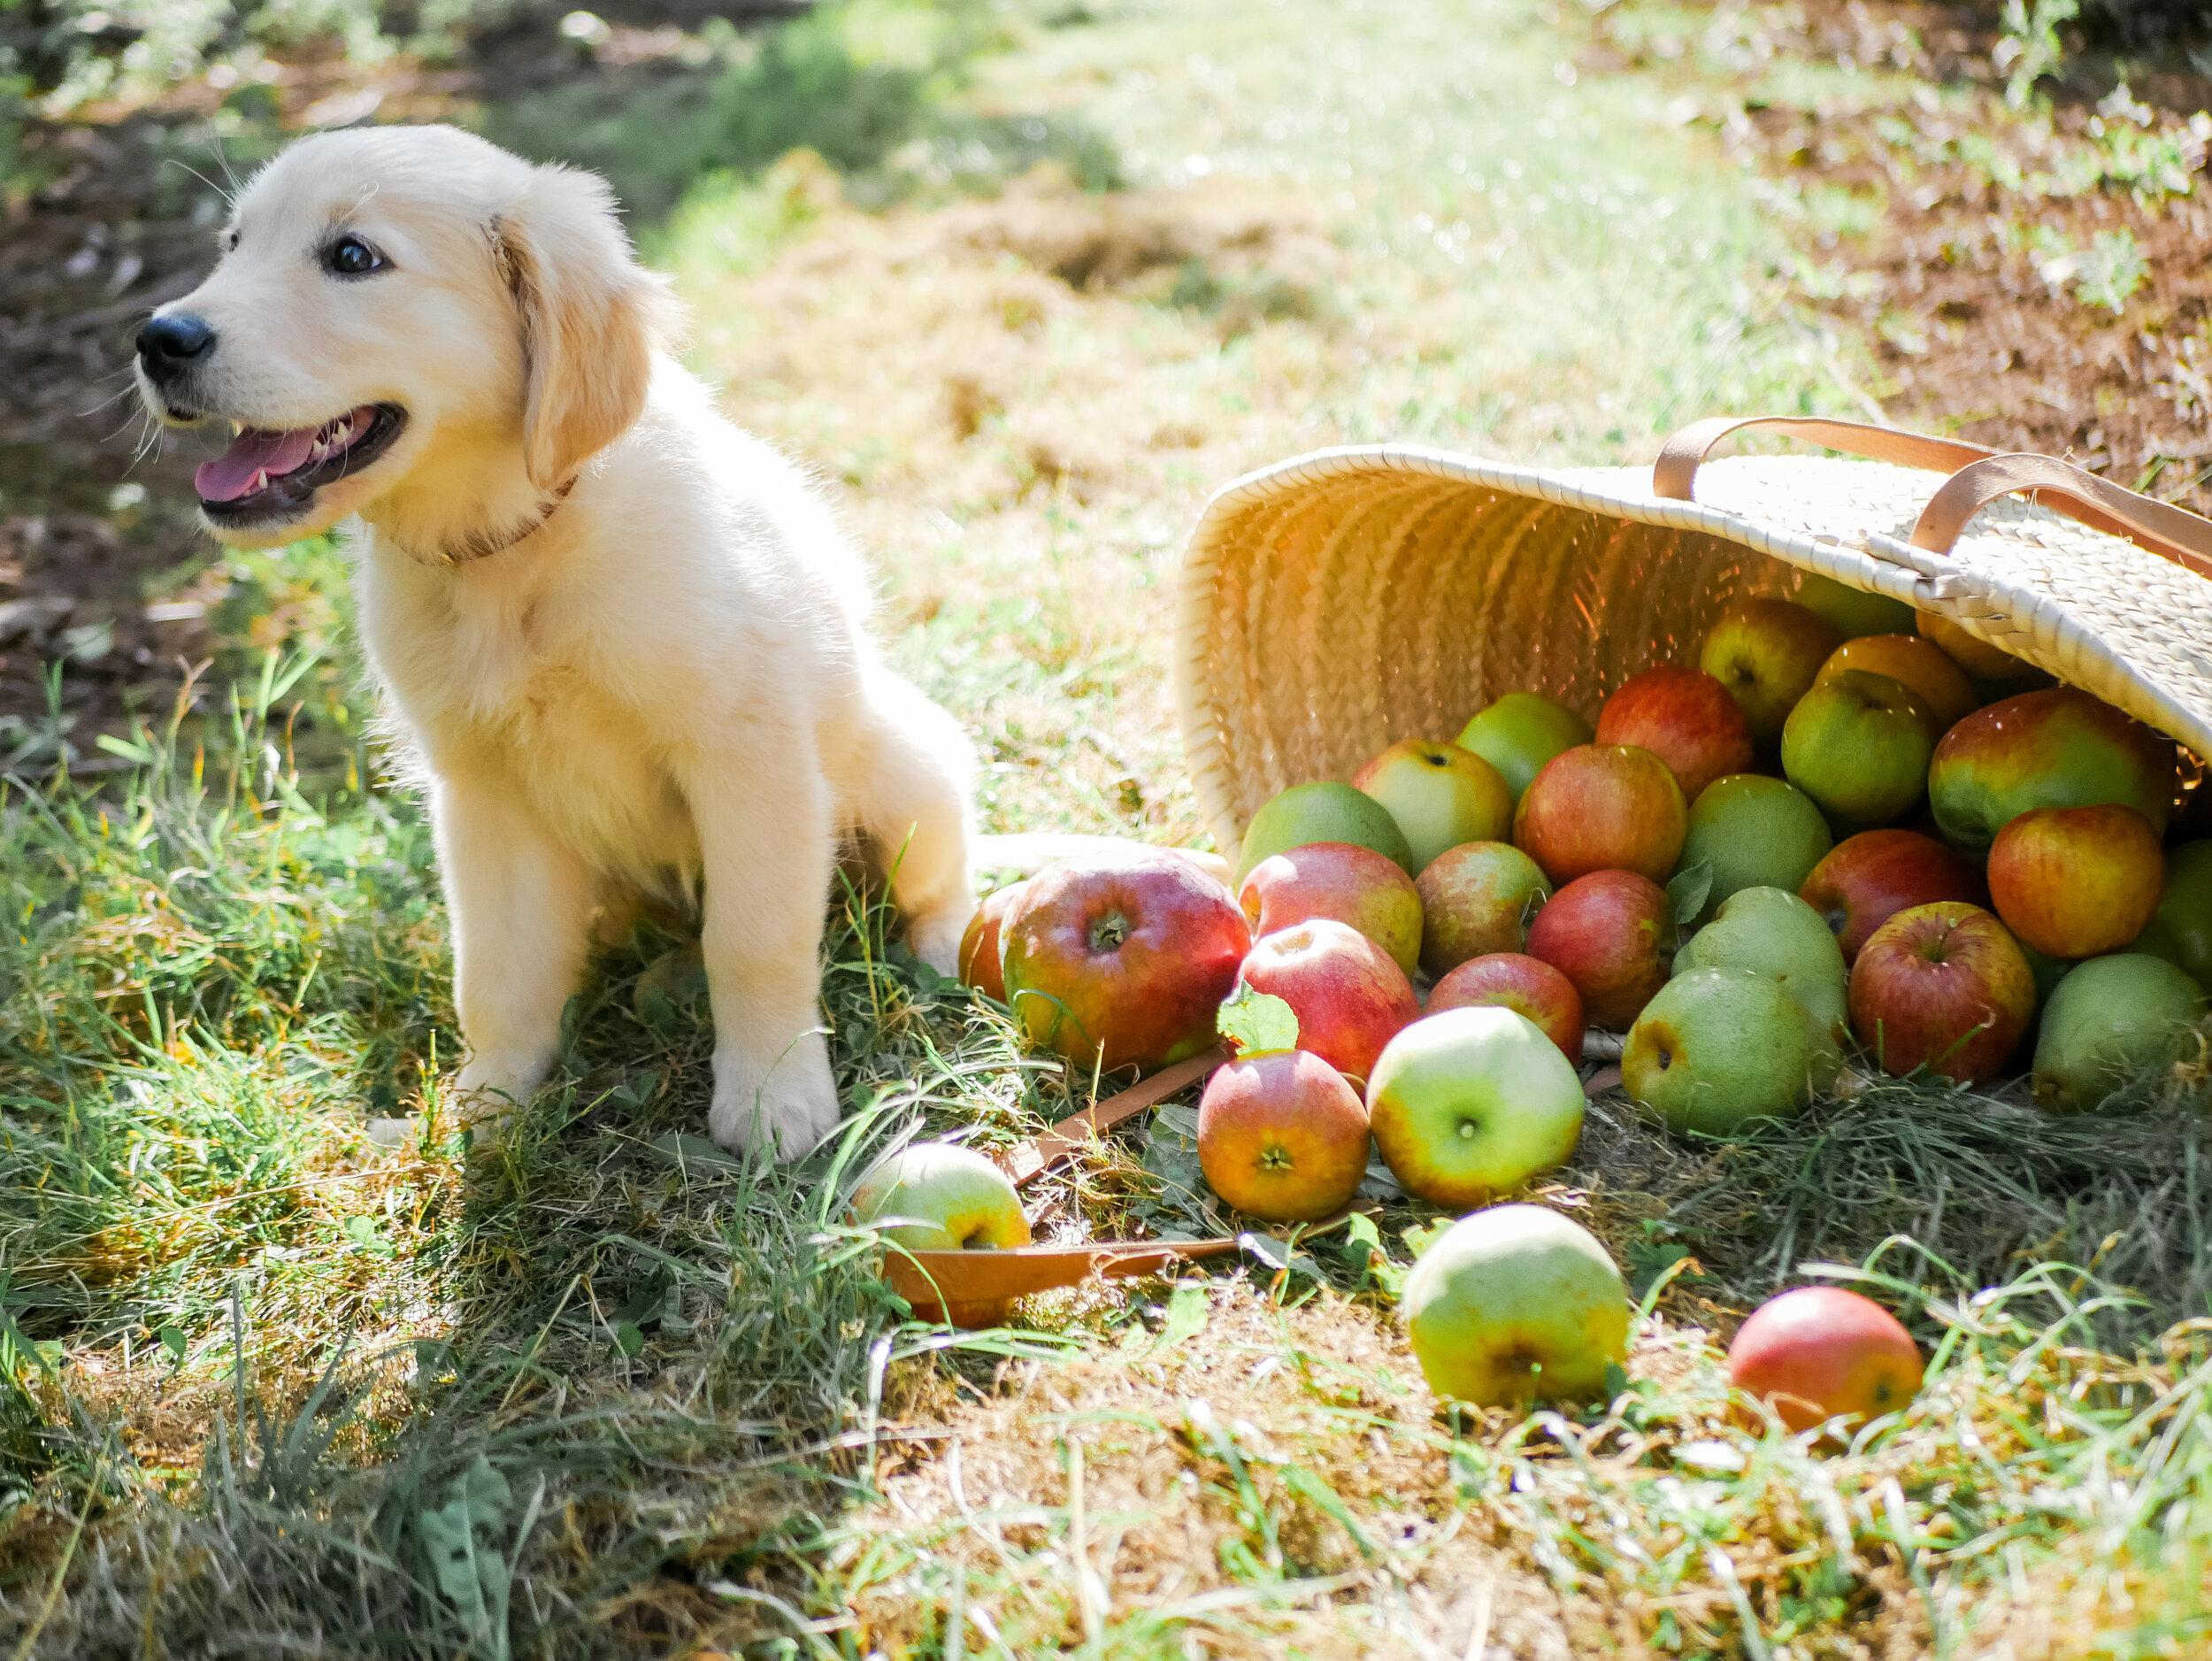 Benny Goes Apple Picking